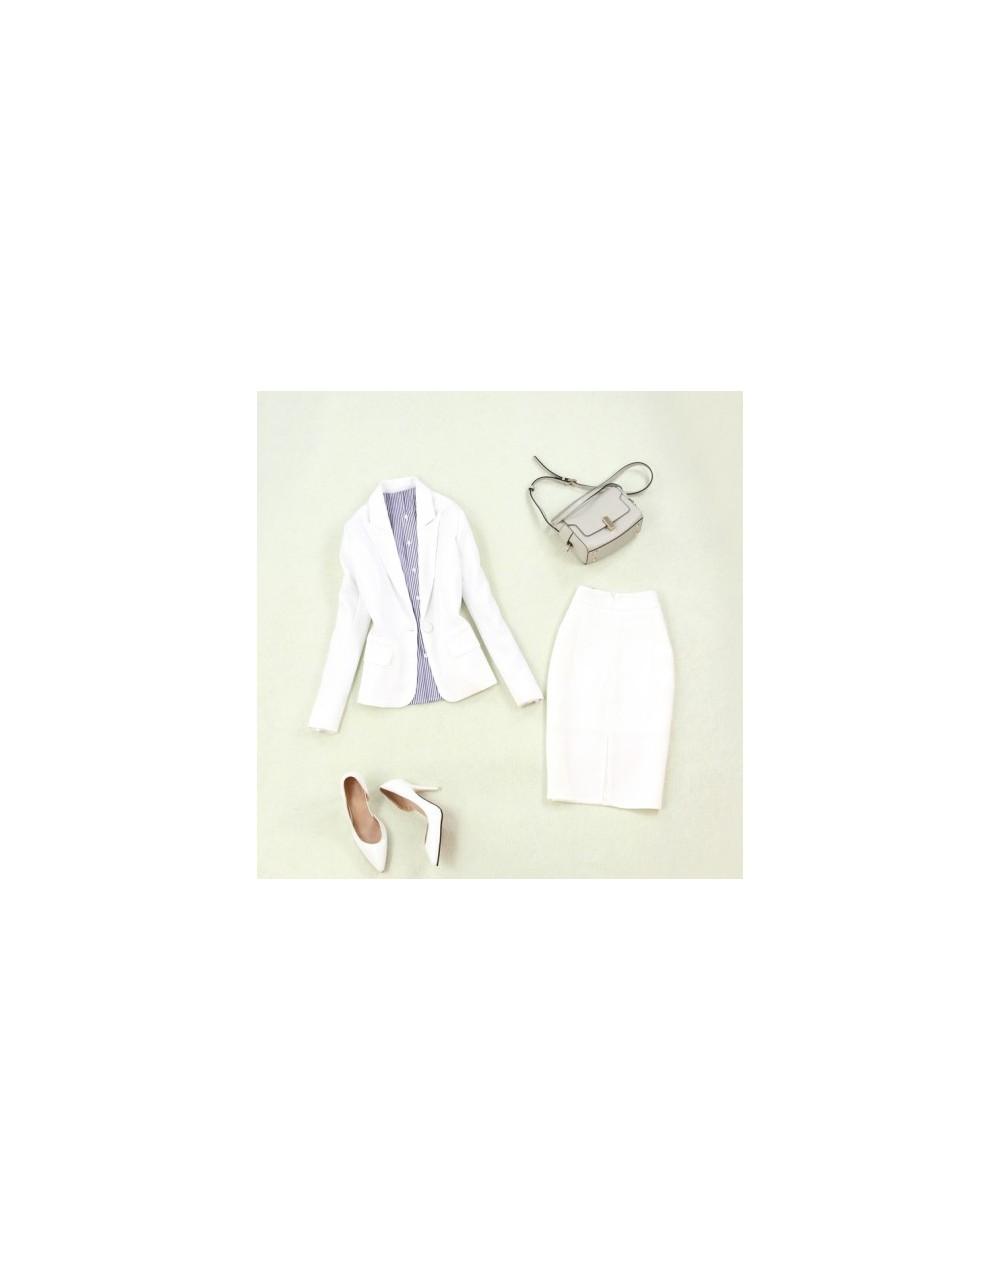 Women's suits 2019 summer new women's large size single buckle white small suit jacket Slim bag hip split skirt two-piece su...